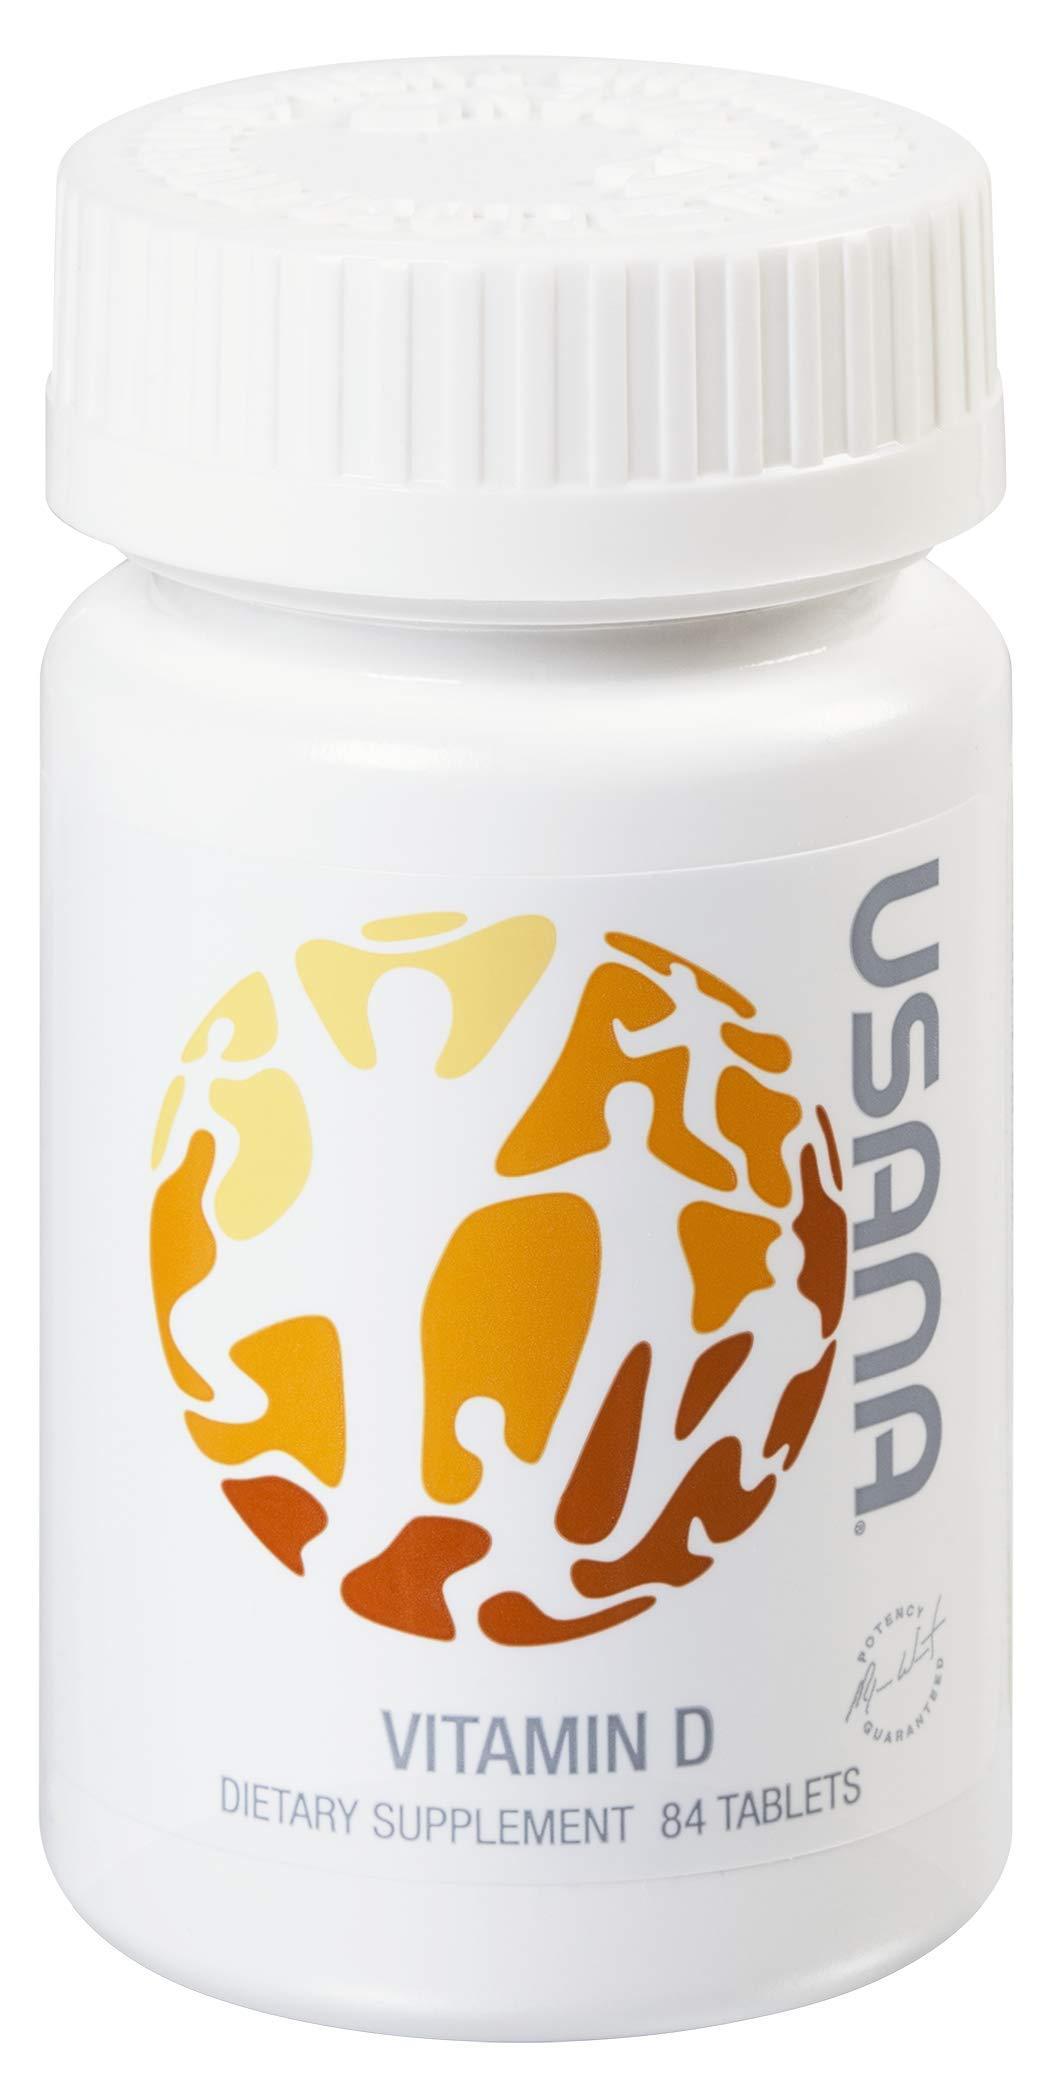 USANA Vitamin D Dietary Supplement - 84 Count